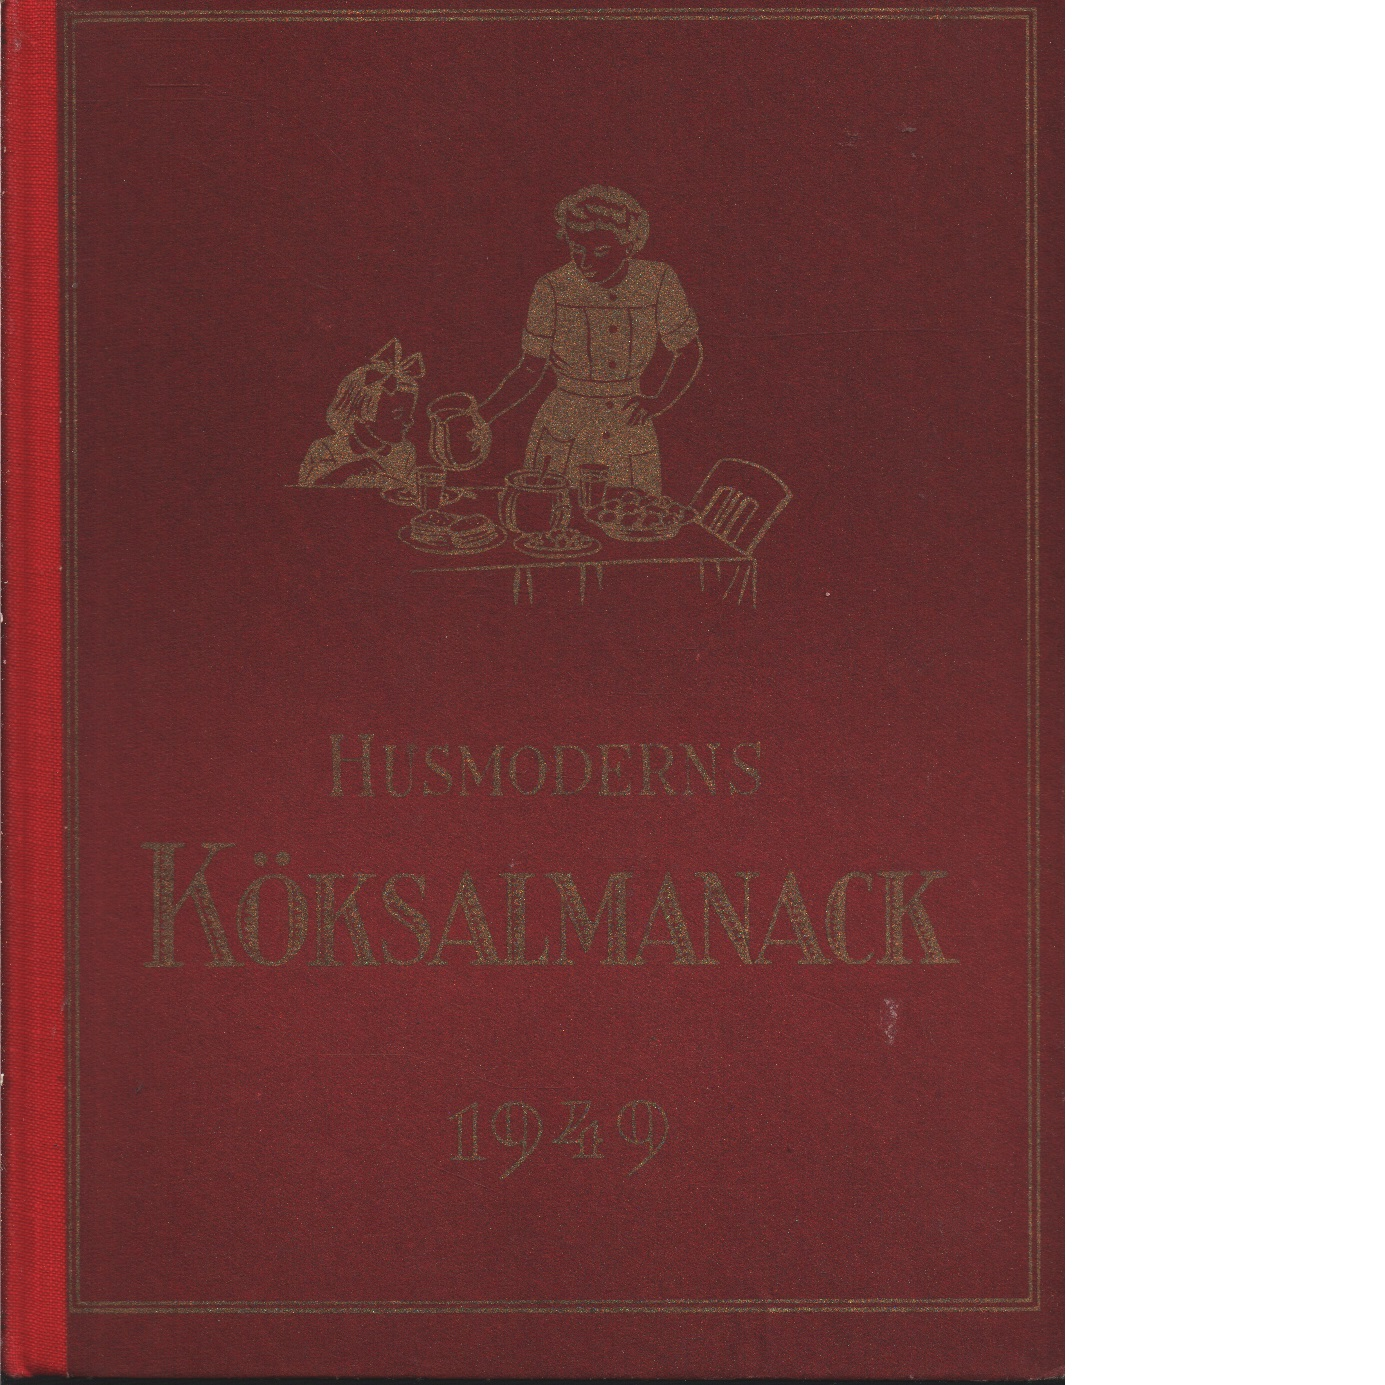 Husmoderns köksalmanack 1949 - Red.